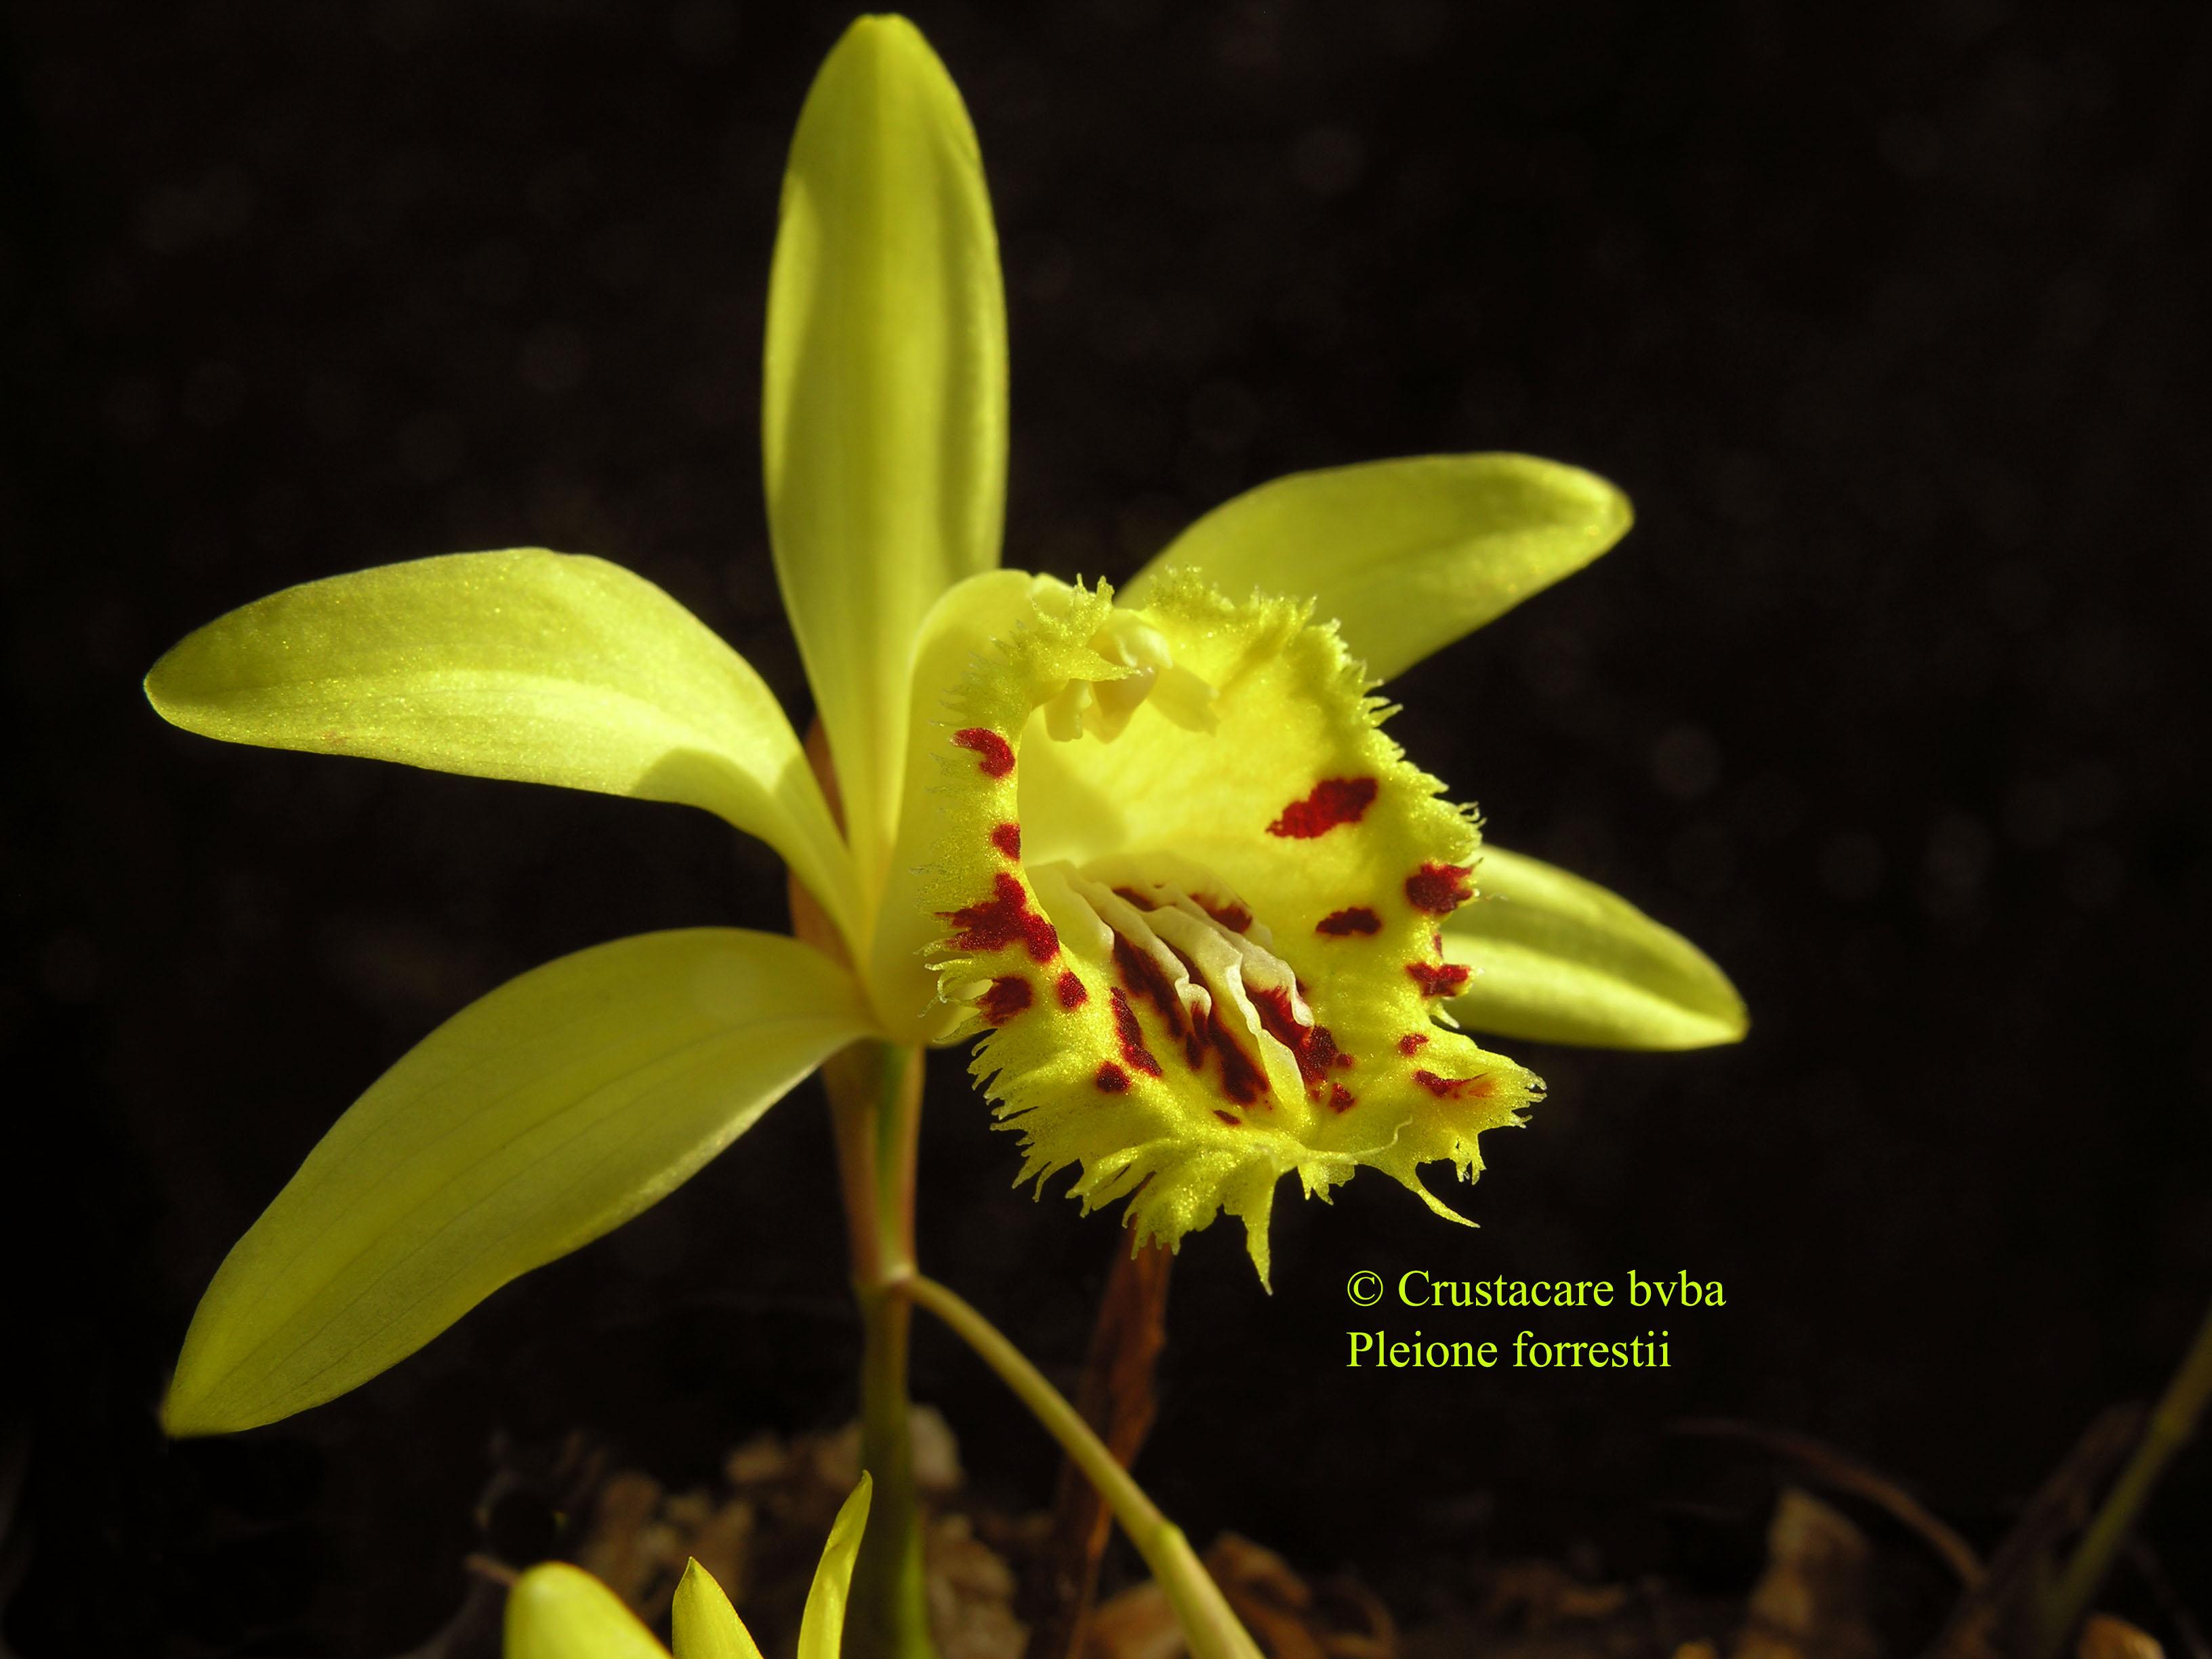 http://www.albiflora.be/files/planten/210/pleione%20forrestii2.jpg